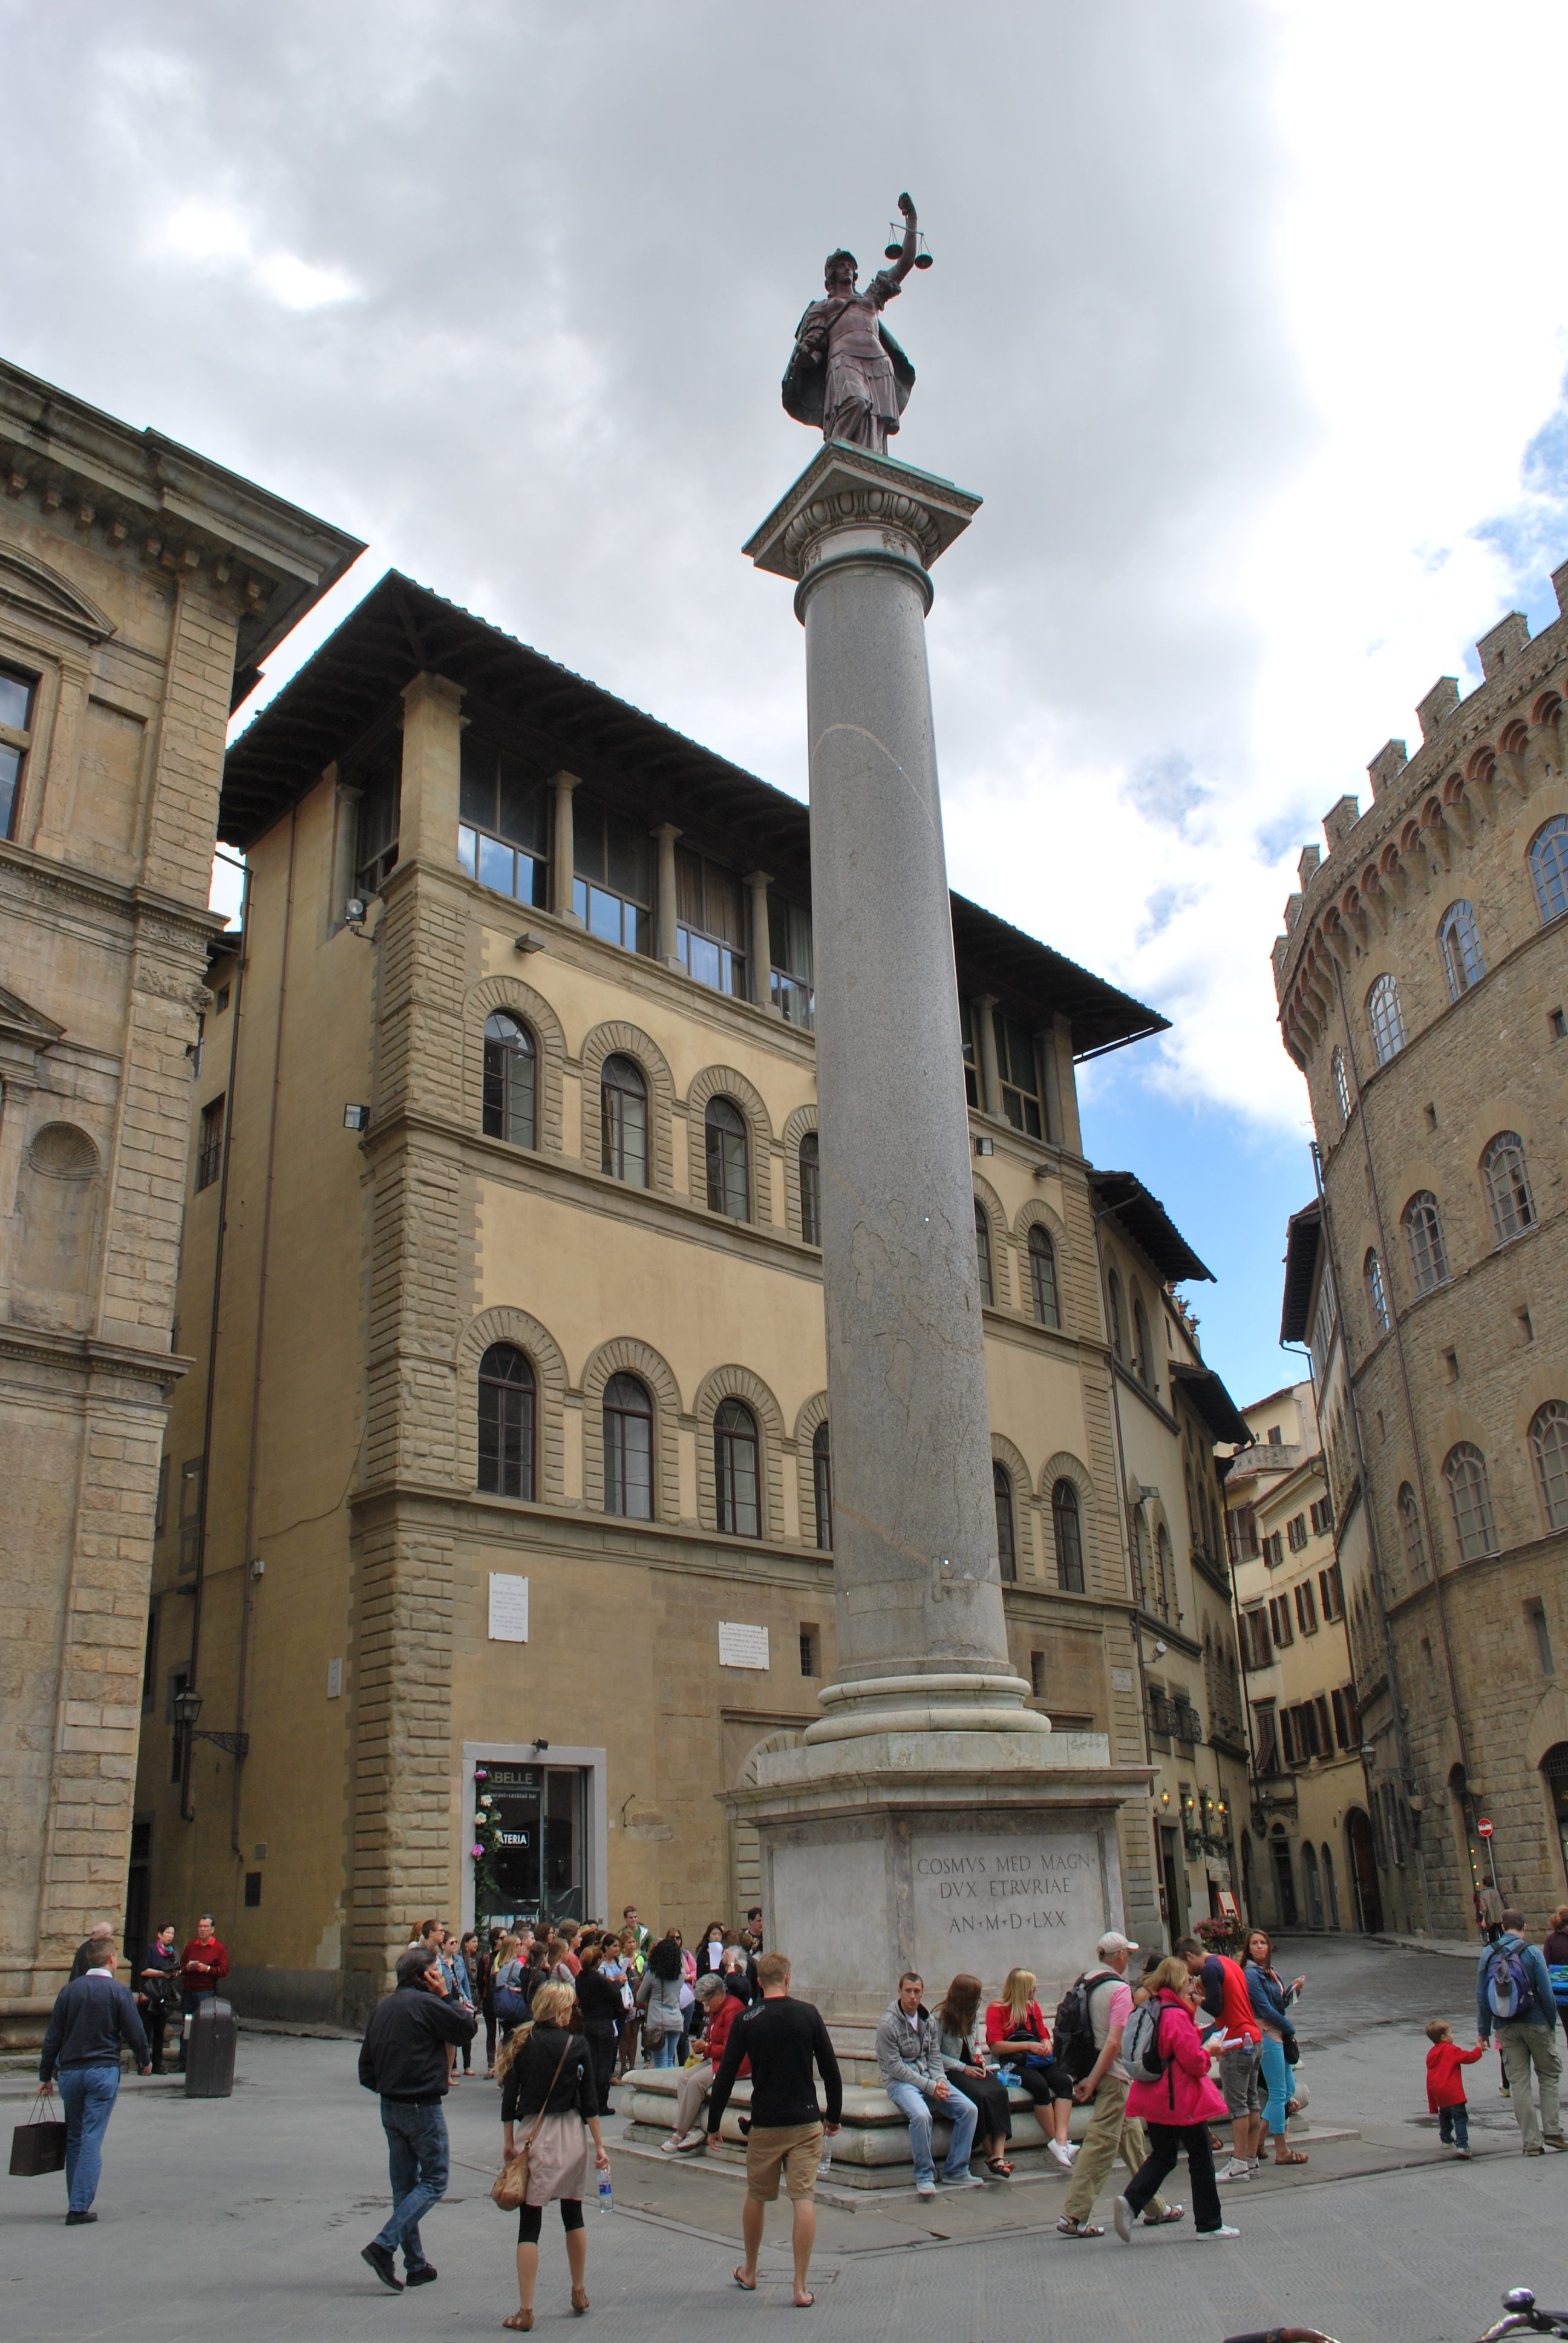 Piazza di Santa Trinta